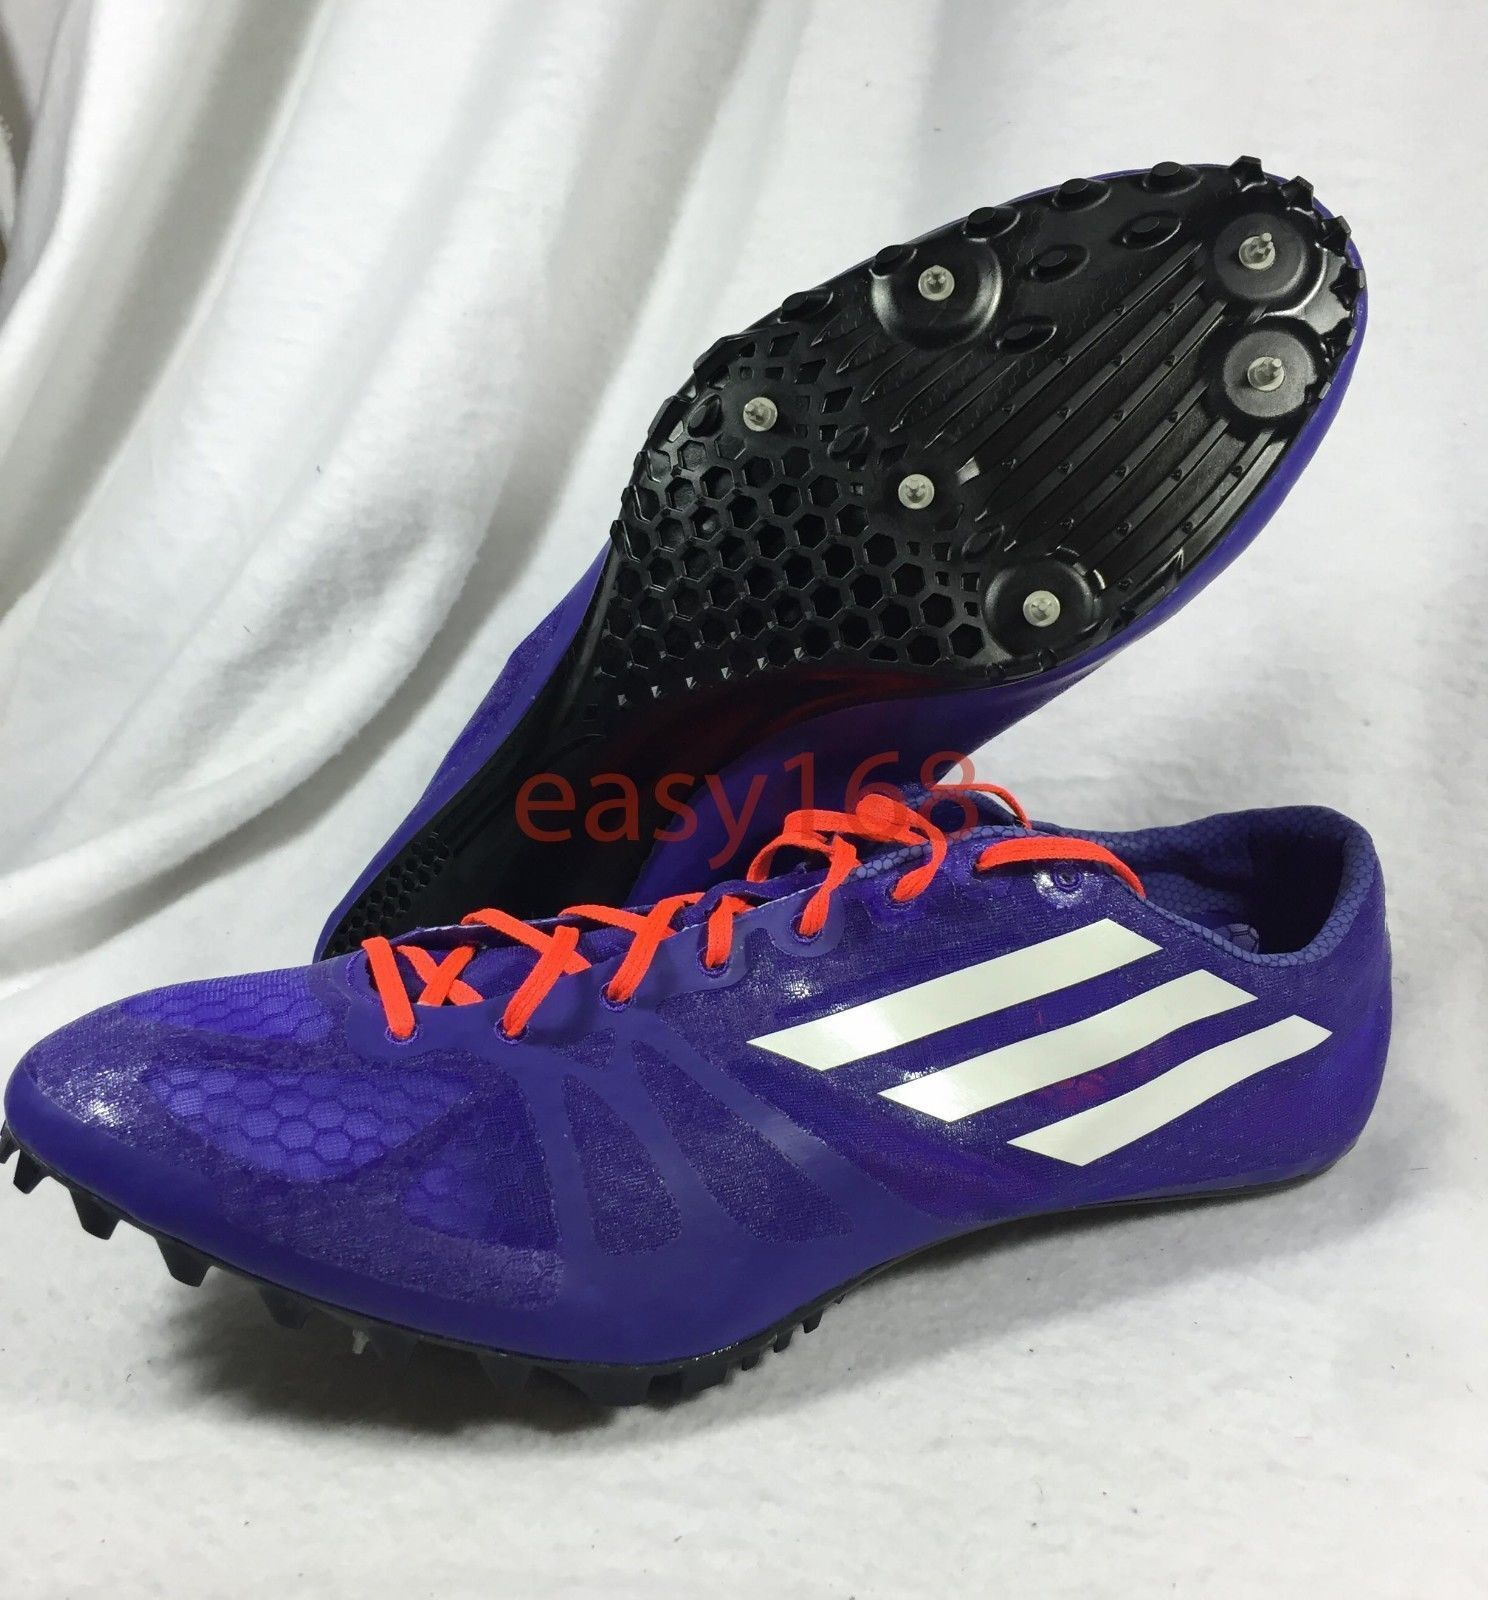 Neue adidas 11,5 adizero prime sp sz 11,5 adidas mens b41015 spikes track field sprint - schuhe 8c923a